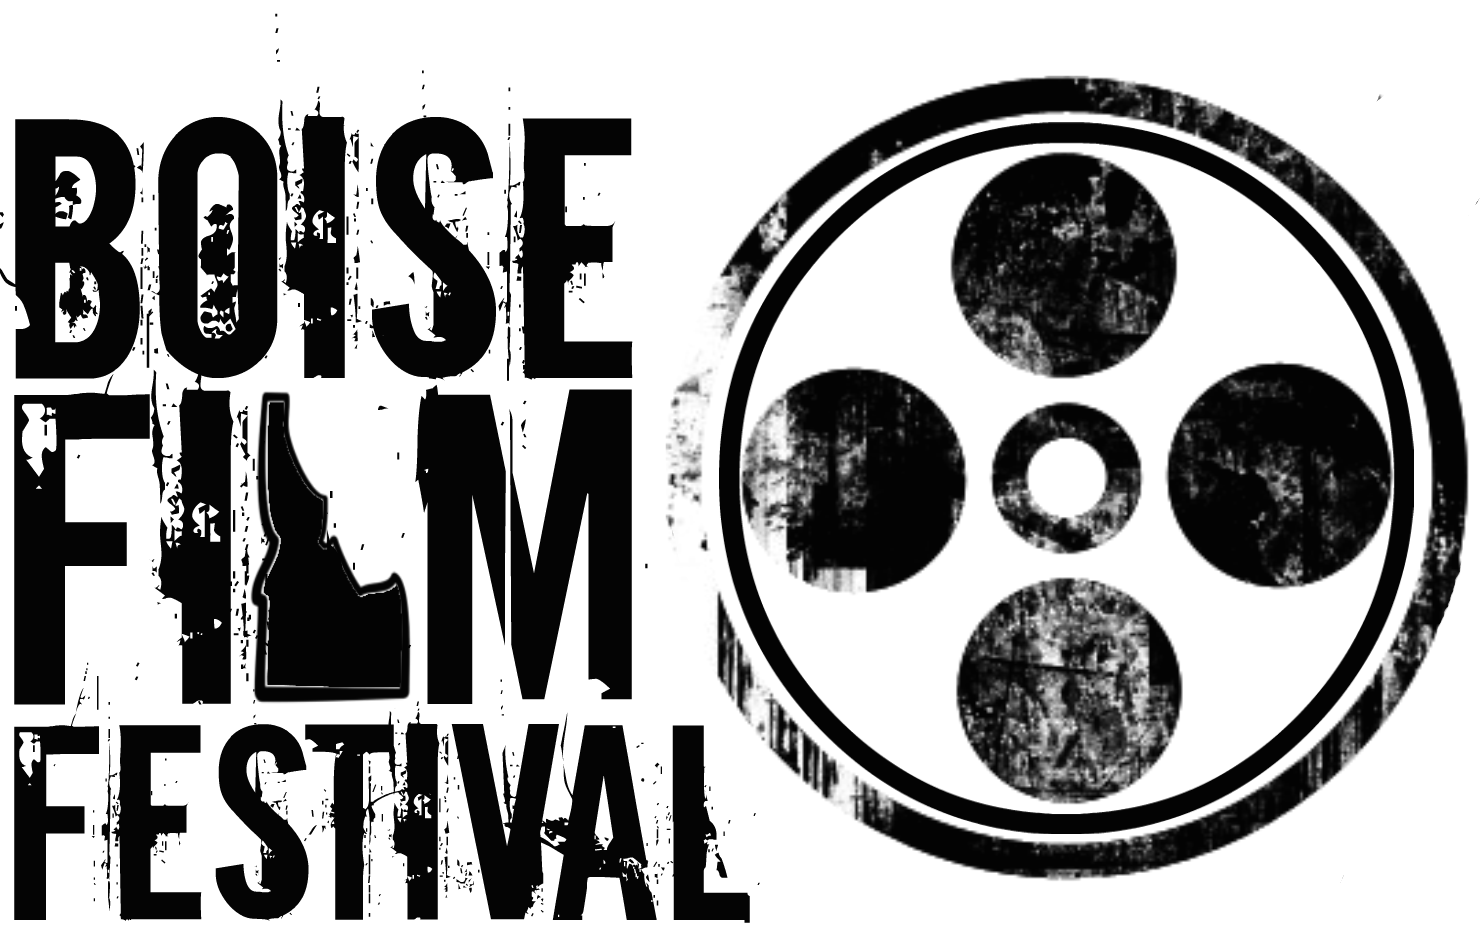 round four boise. Movie clipart film festival